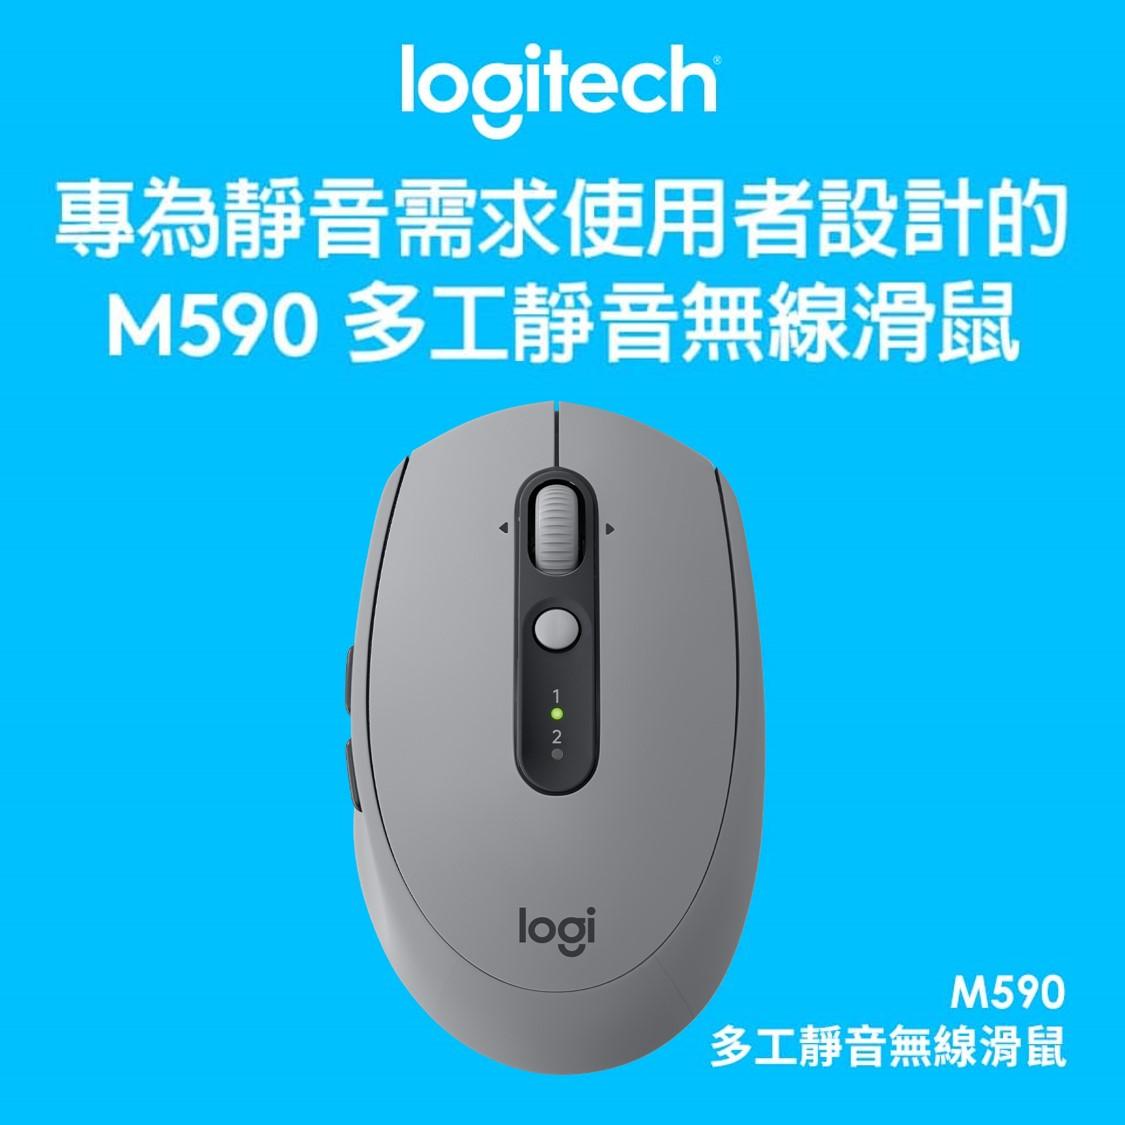 Logitech羅技 M590 多工靜音無線滑鼠 石板灰